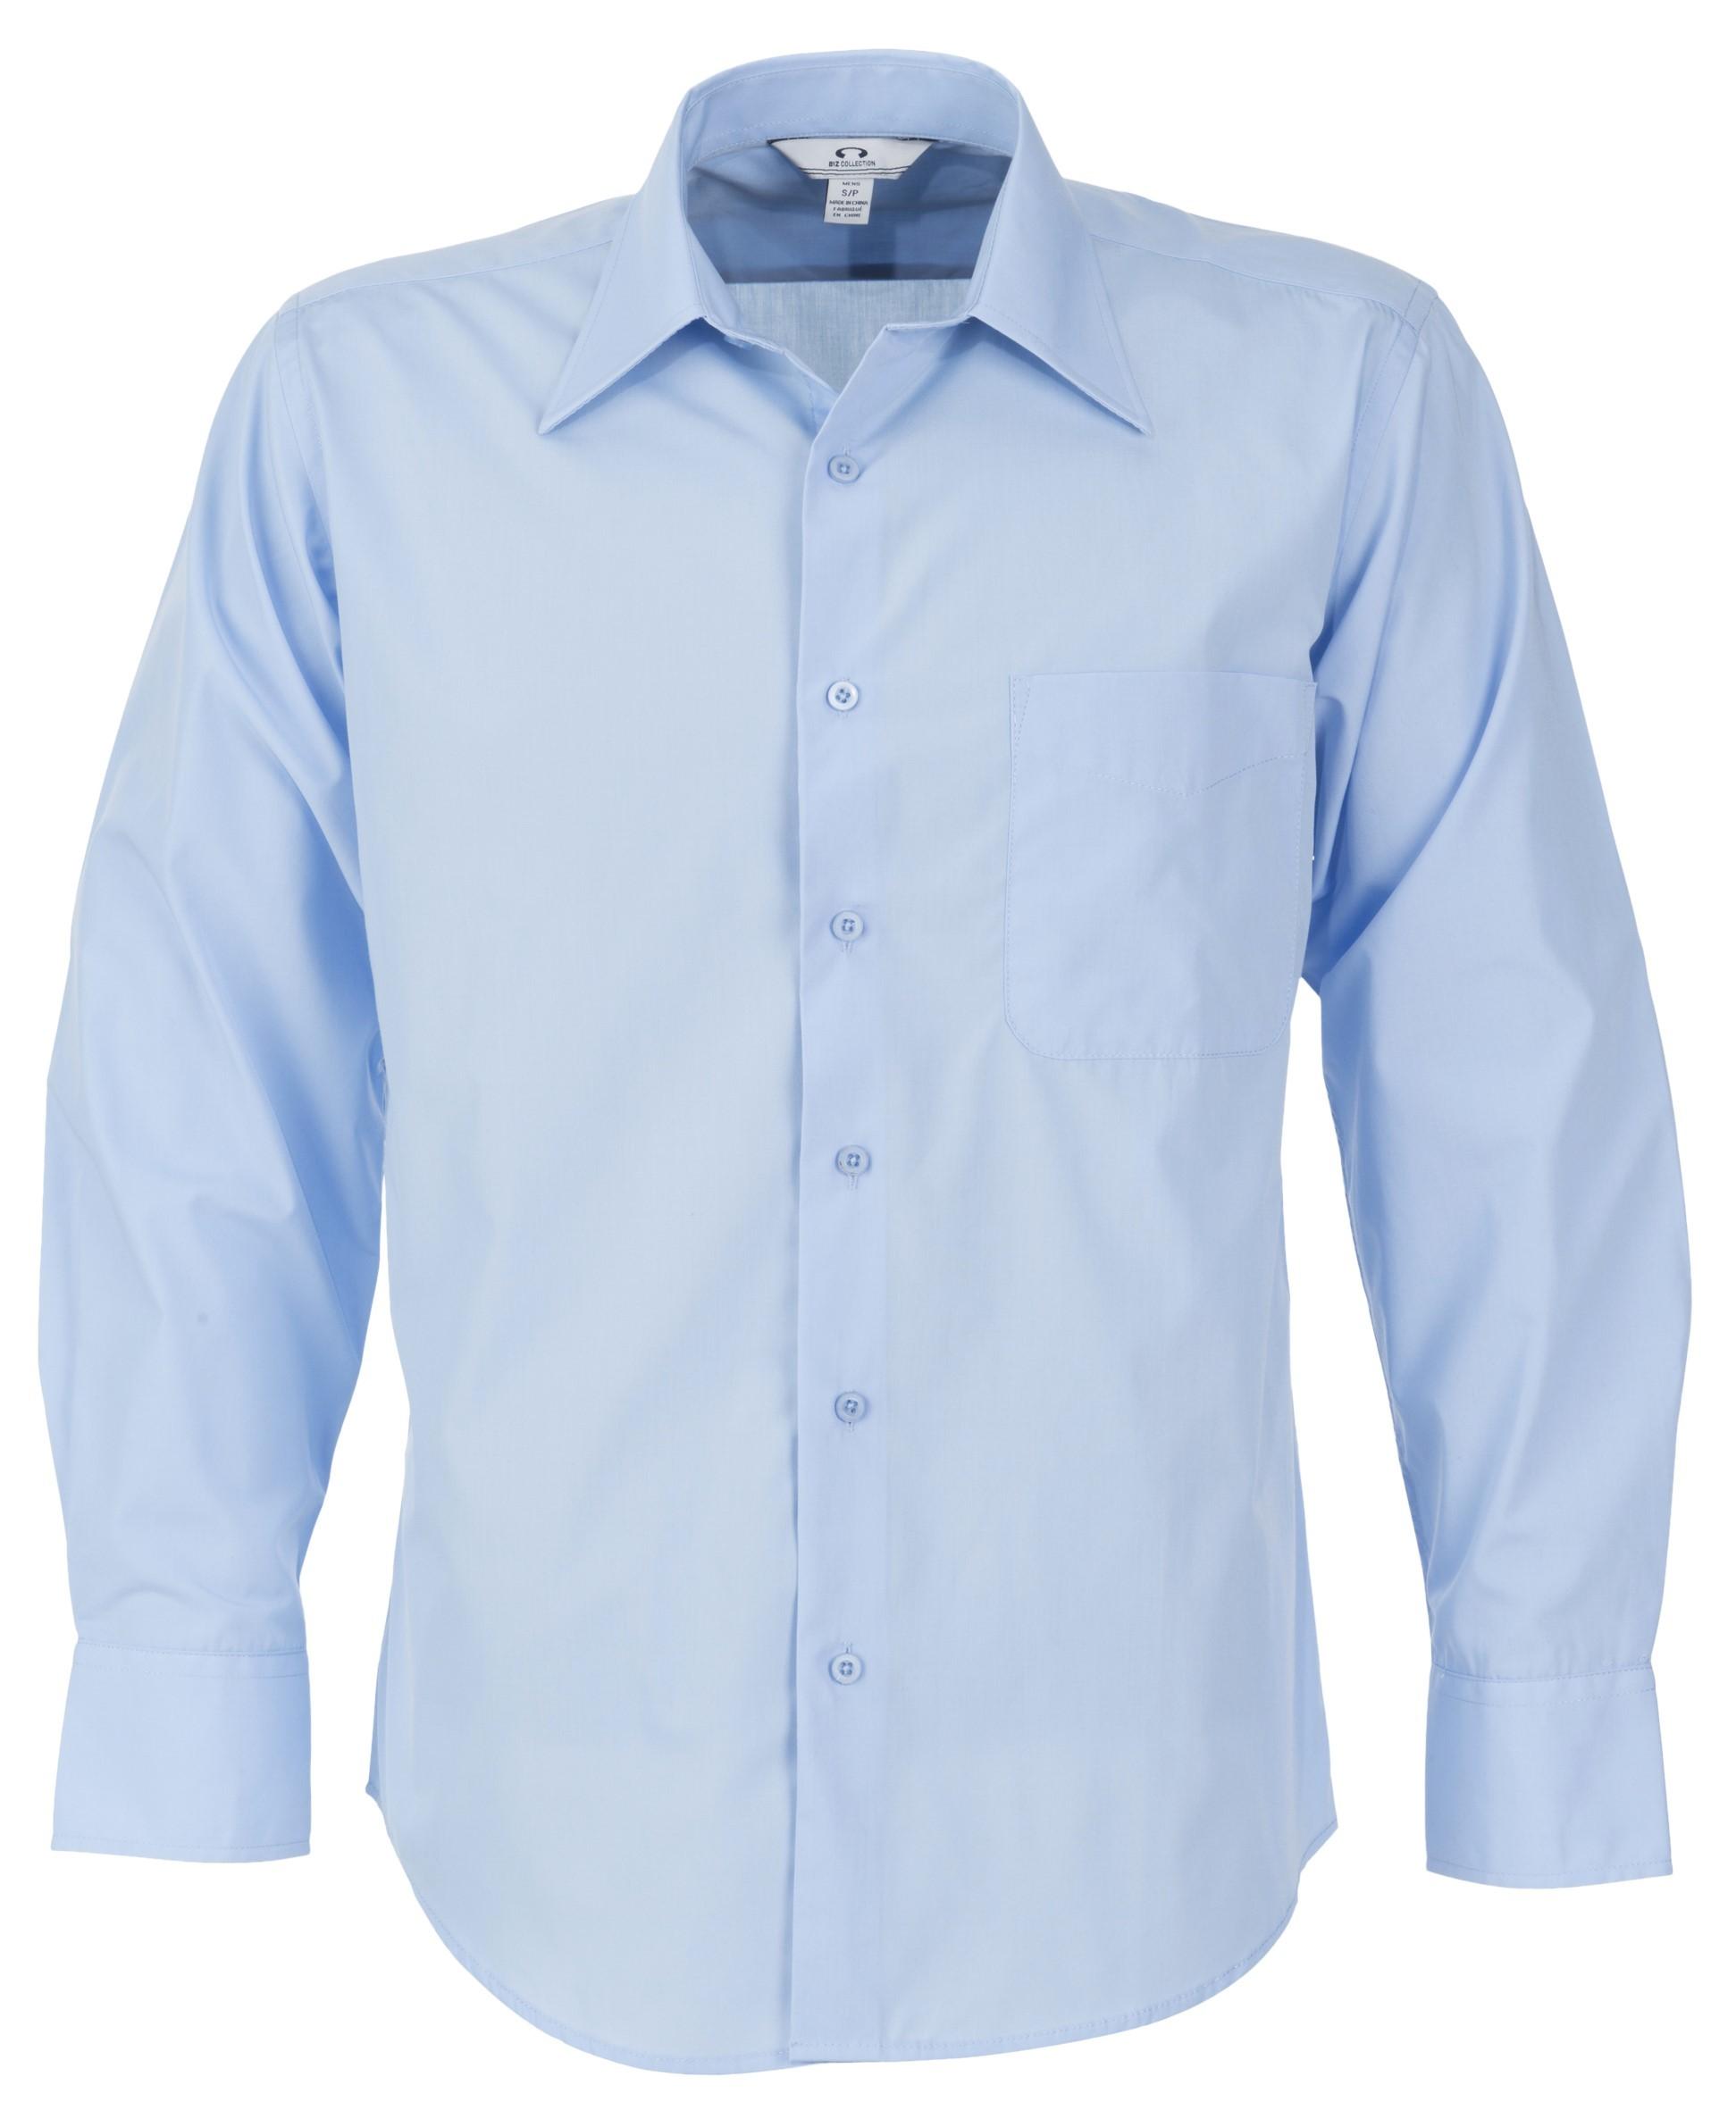 Men's Corporate Lounge Shirts